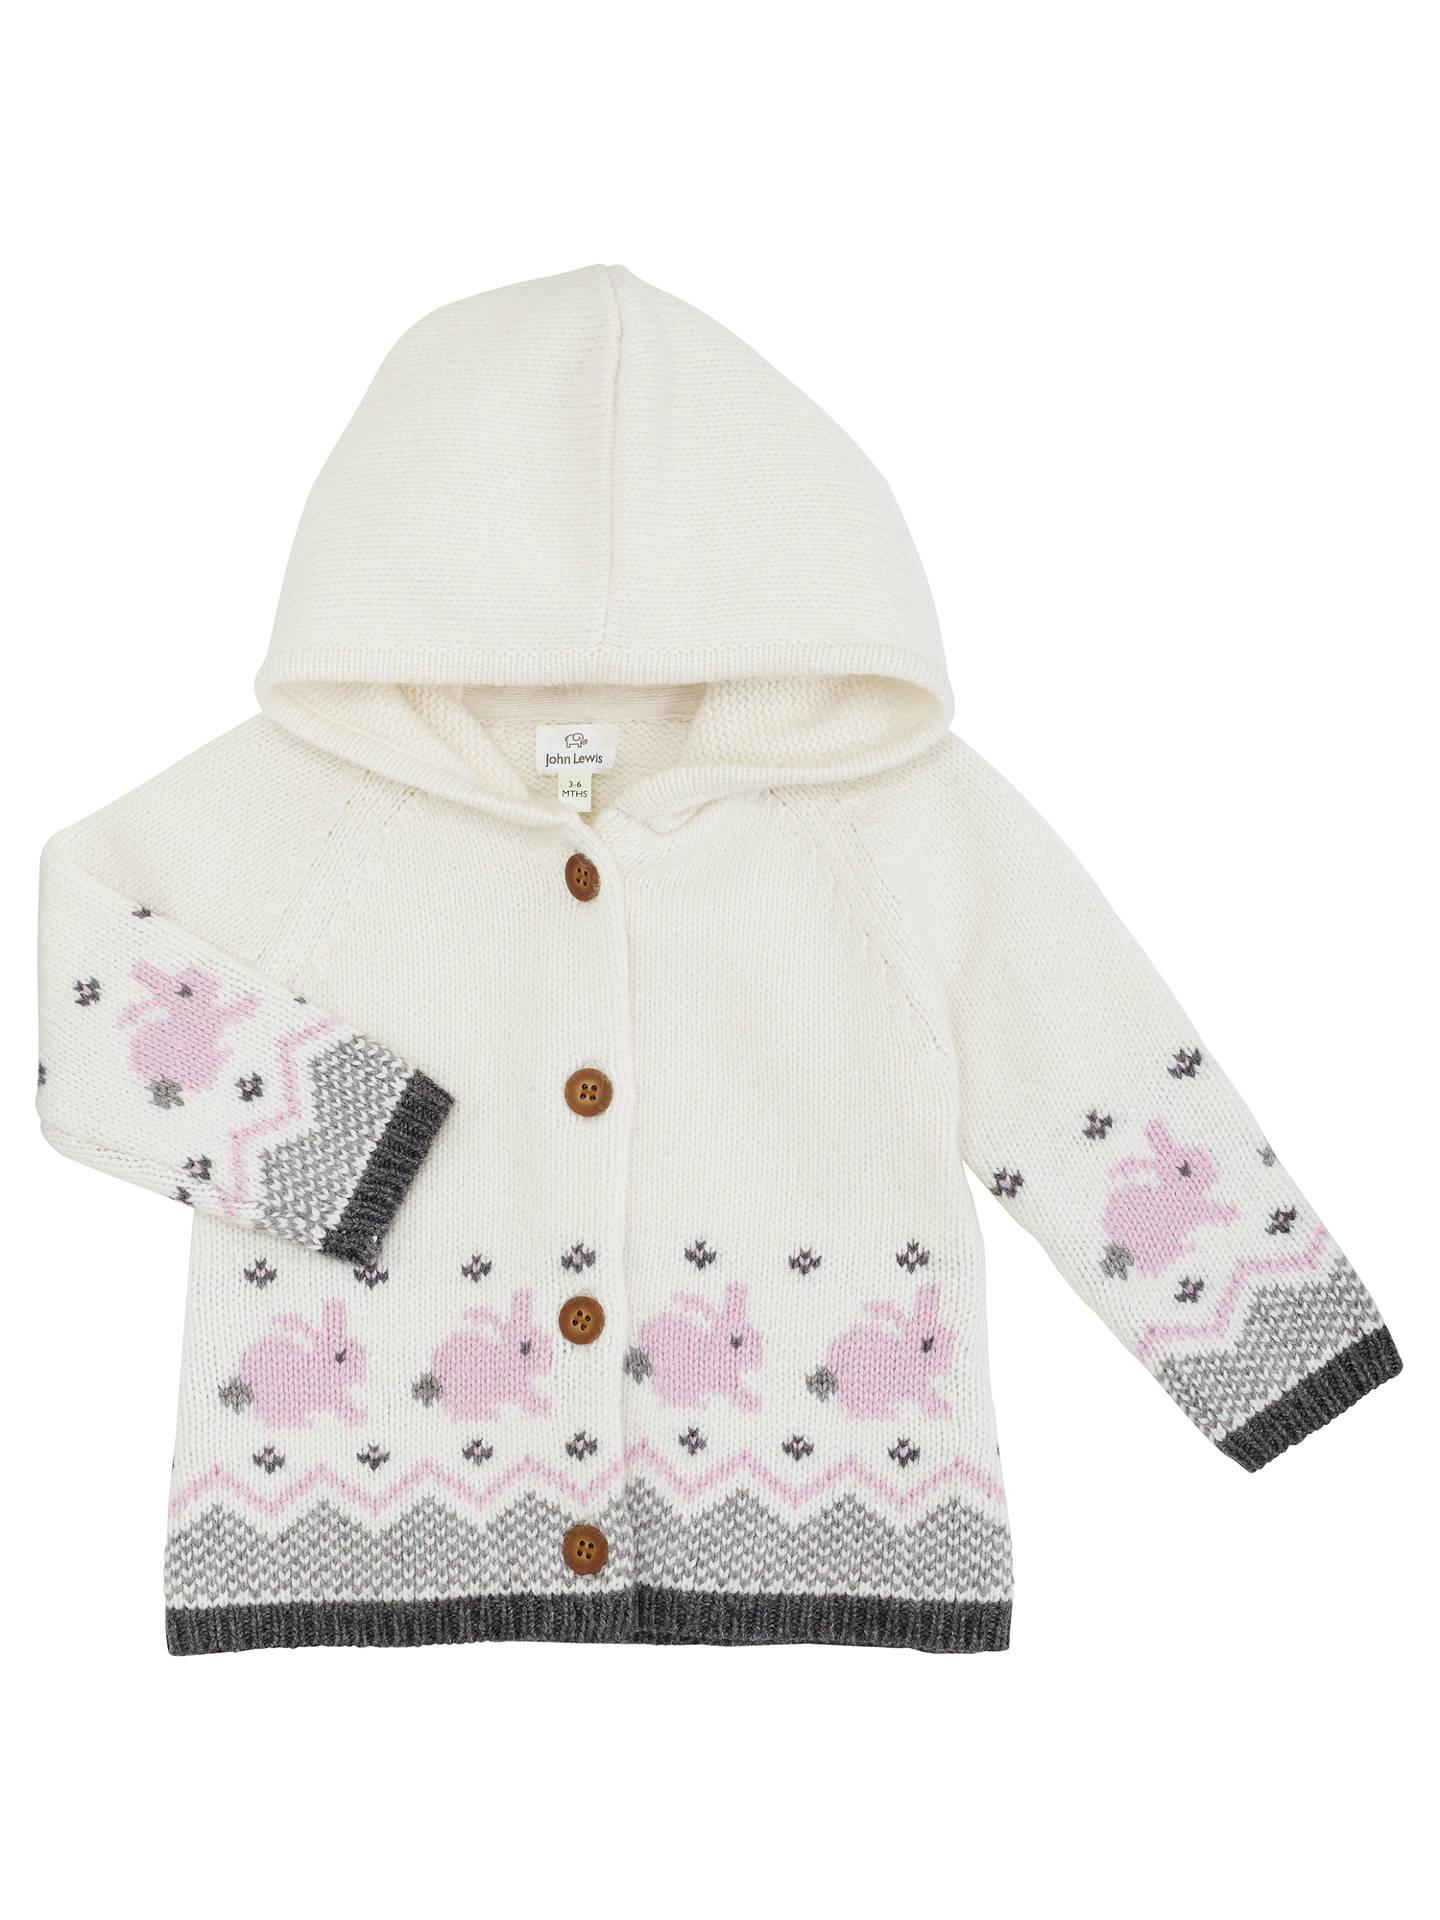 John Lewis Baby Bunny Hooded Coat, Pink at John Lewis & Partners